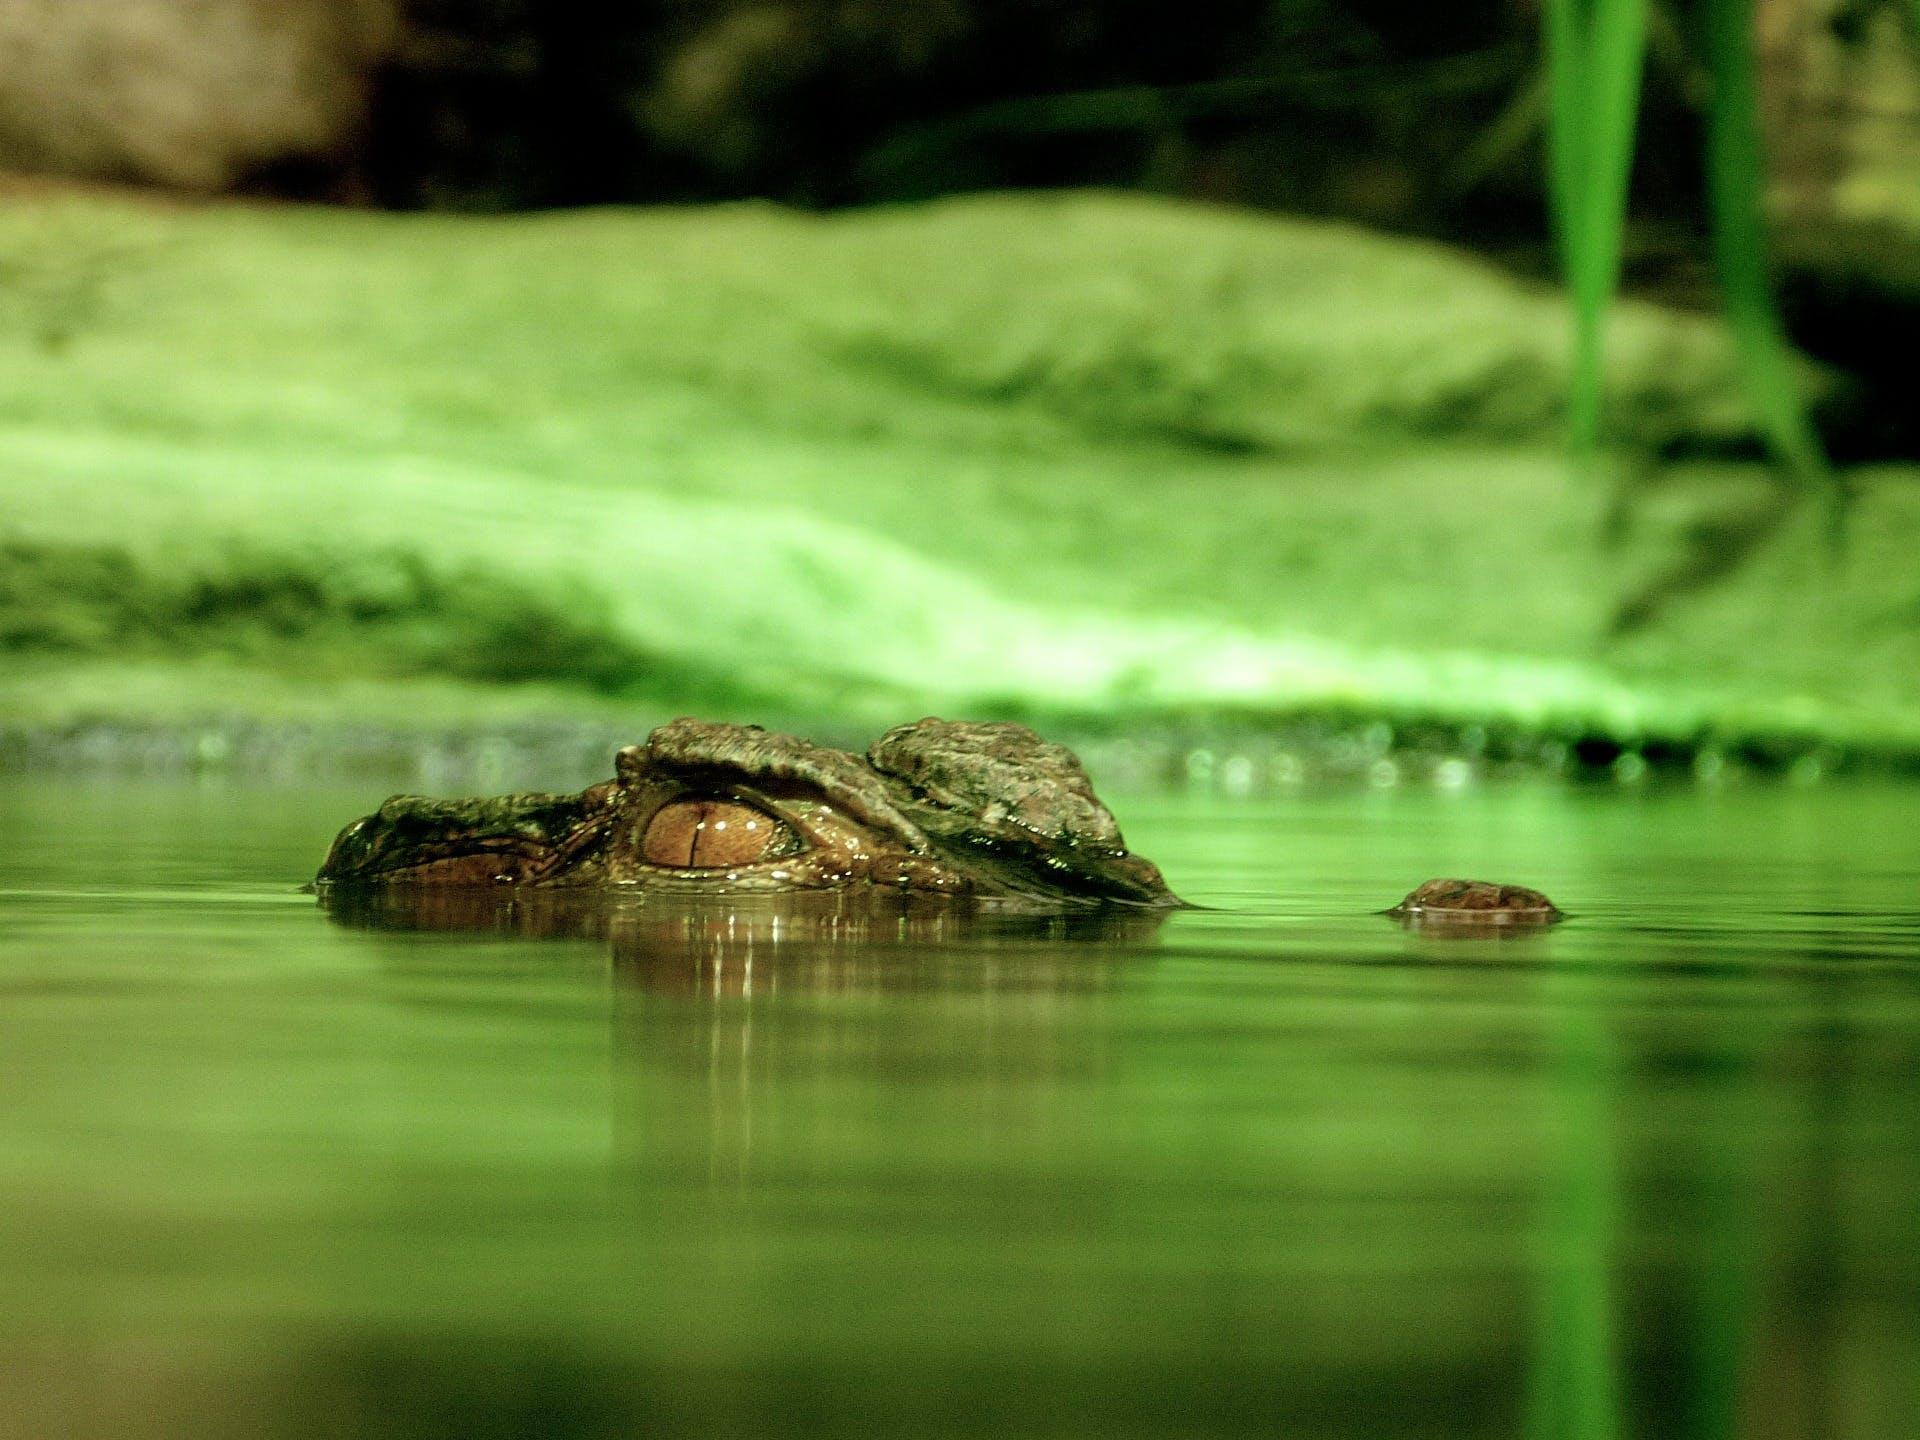 Green Crocodile Under Body of Water